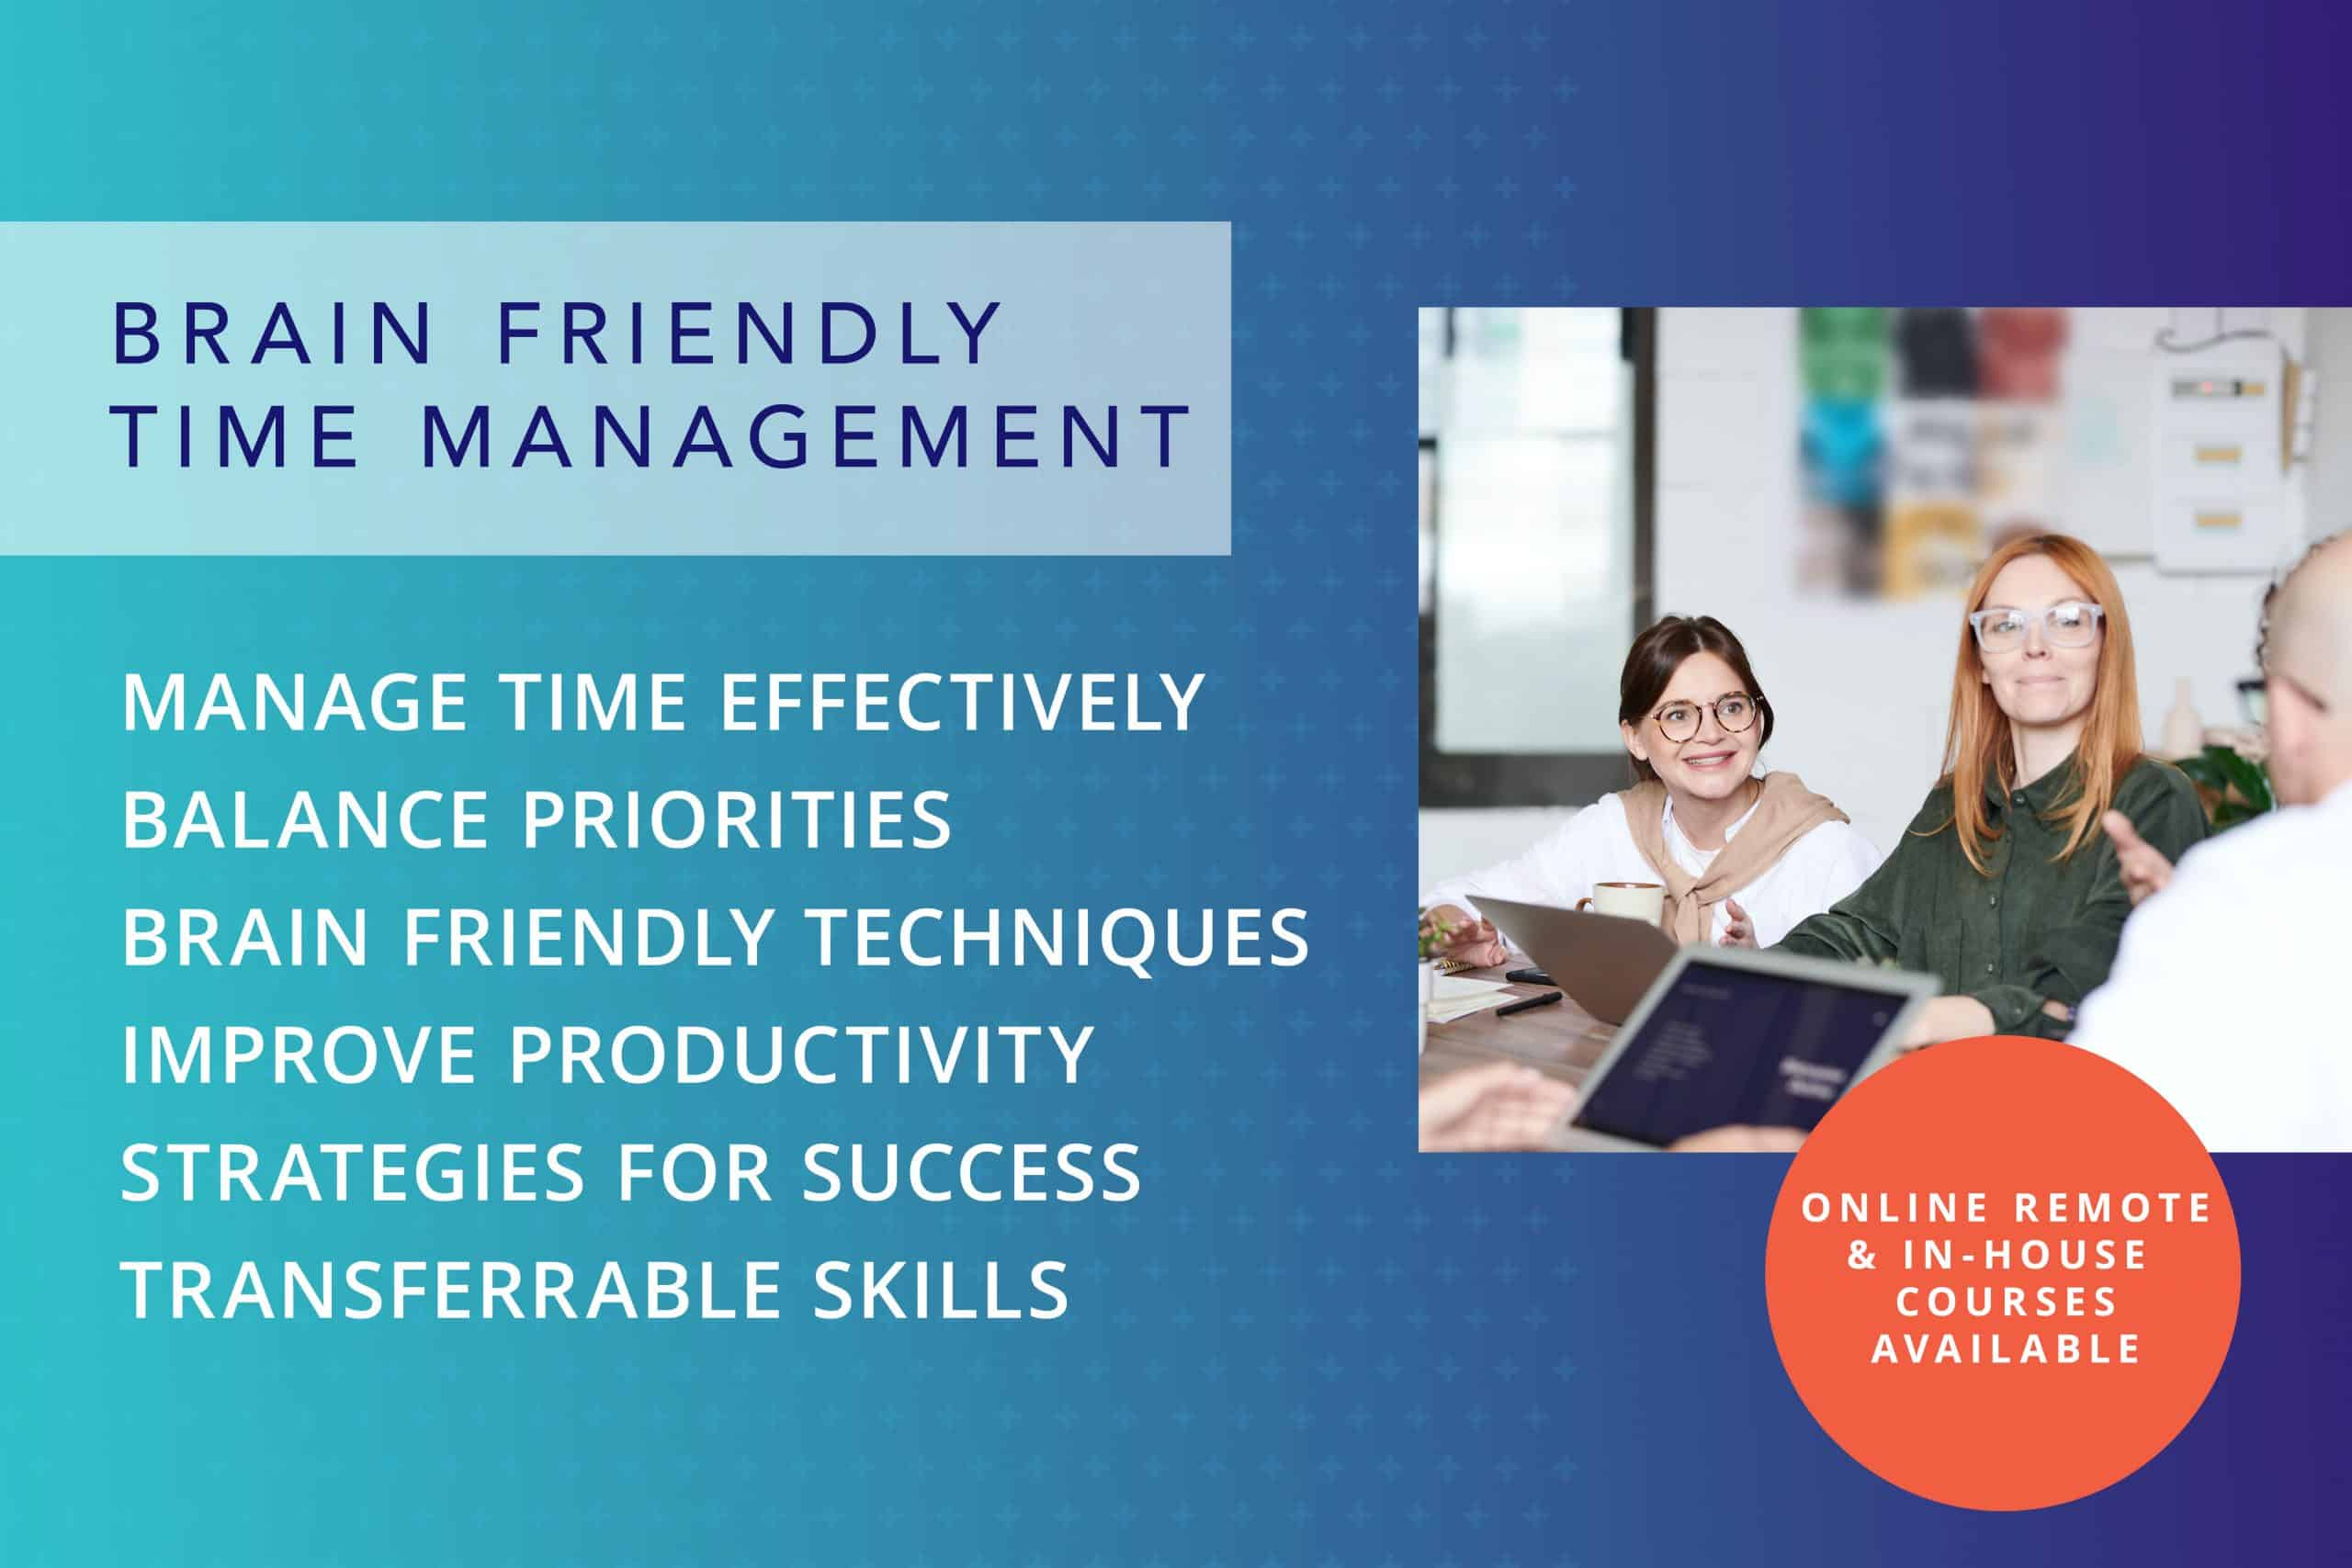 Brain Friendly Time Management Workshop